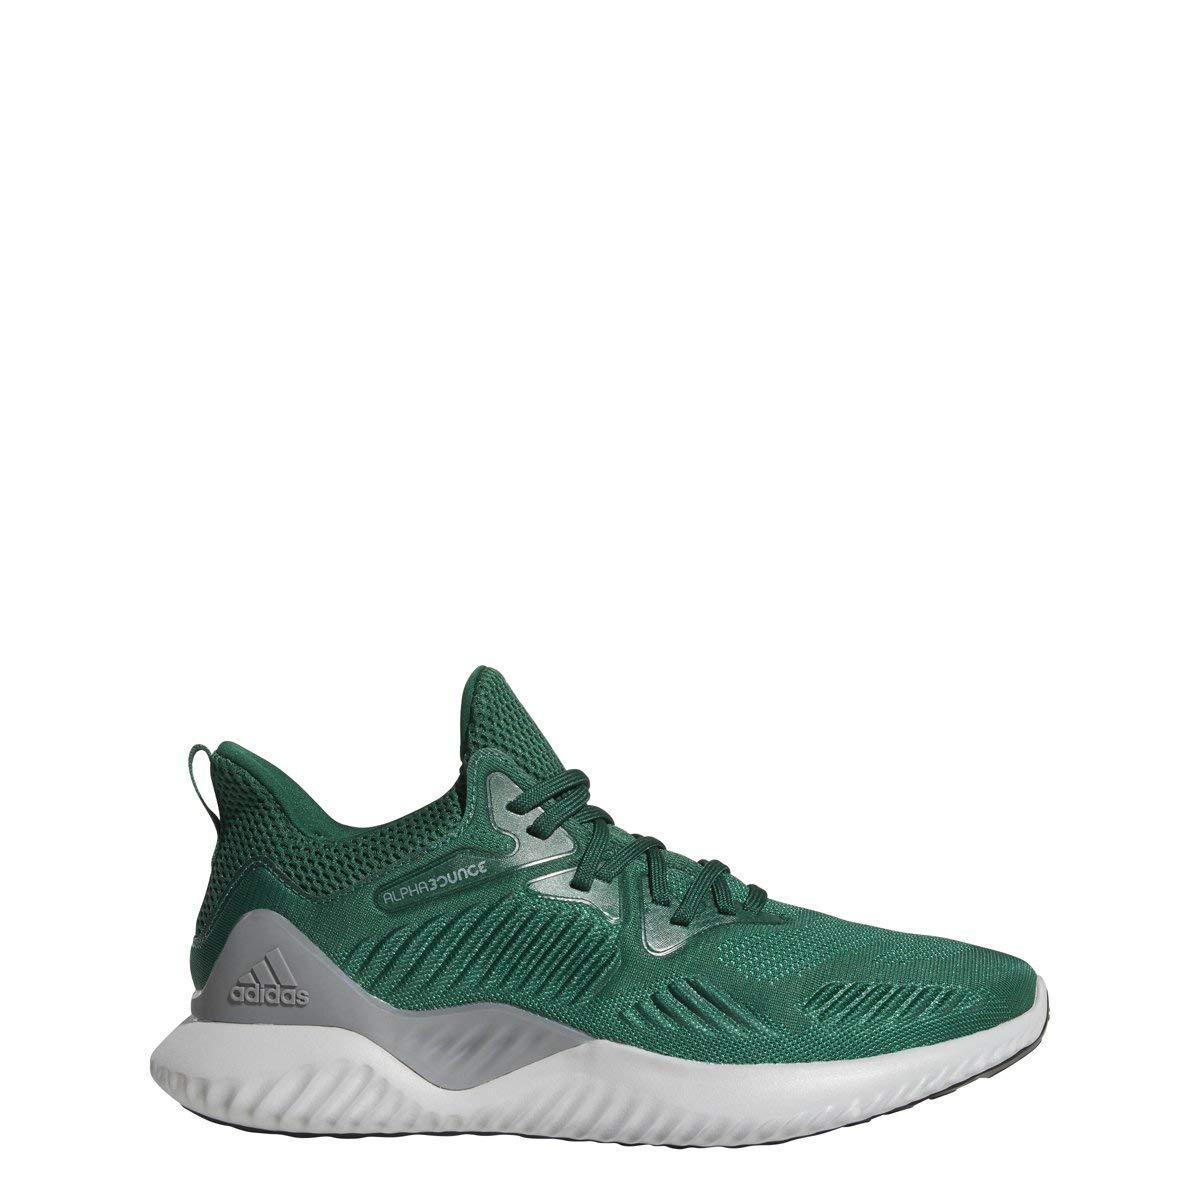 Image of adidas Originals Men's Alphabounce Beyond Team Running Shoe Road Running